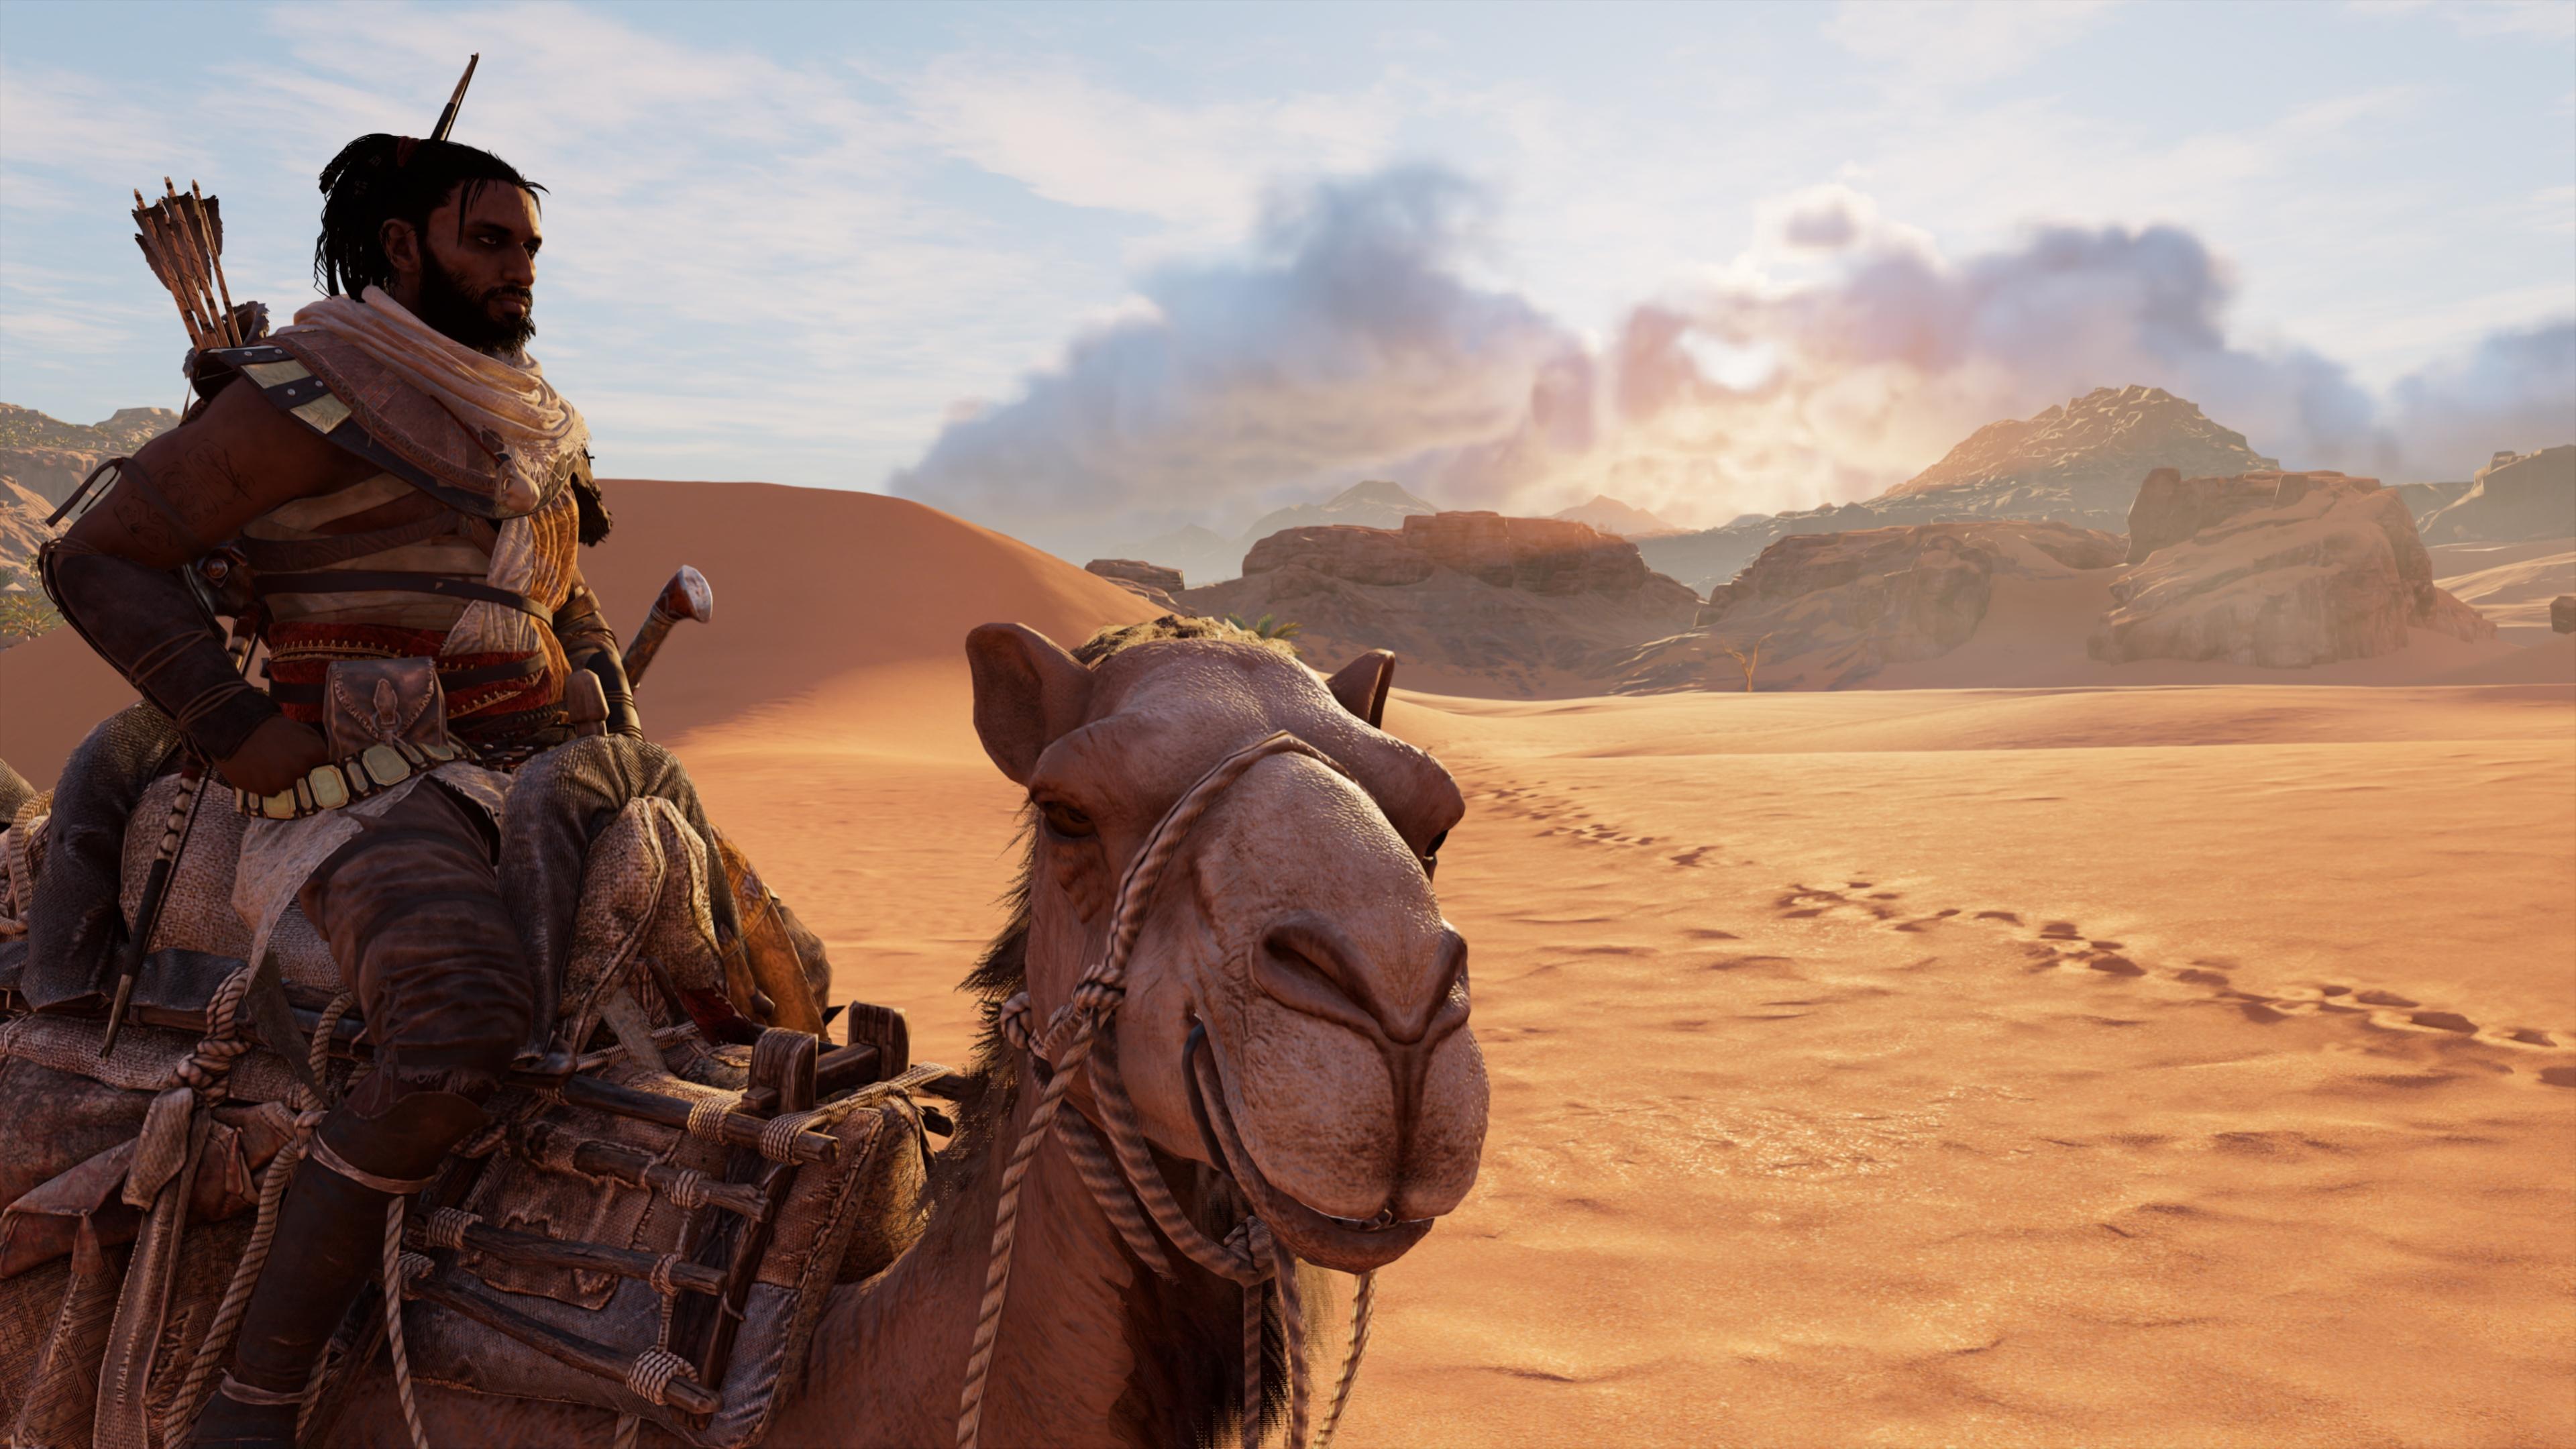 Assassin's Creed: Origins криншот с GeForce RTX 2080 - Assassin's Creed: Origins